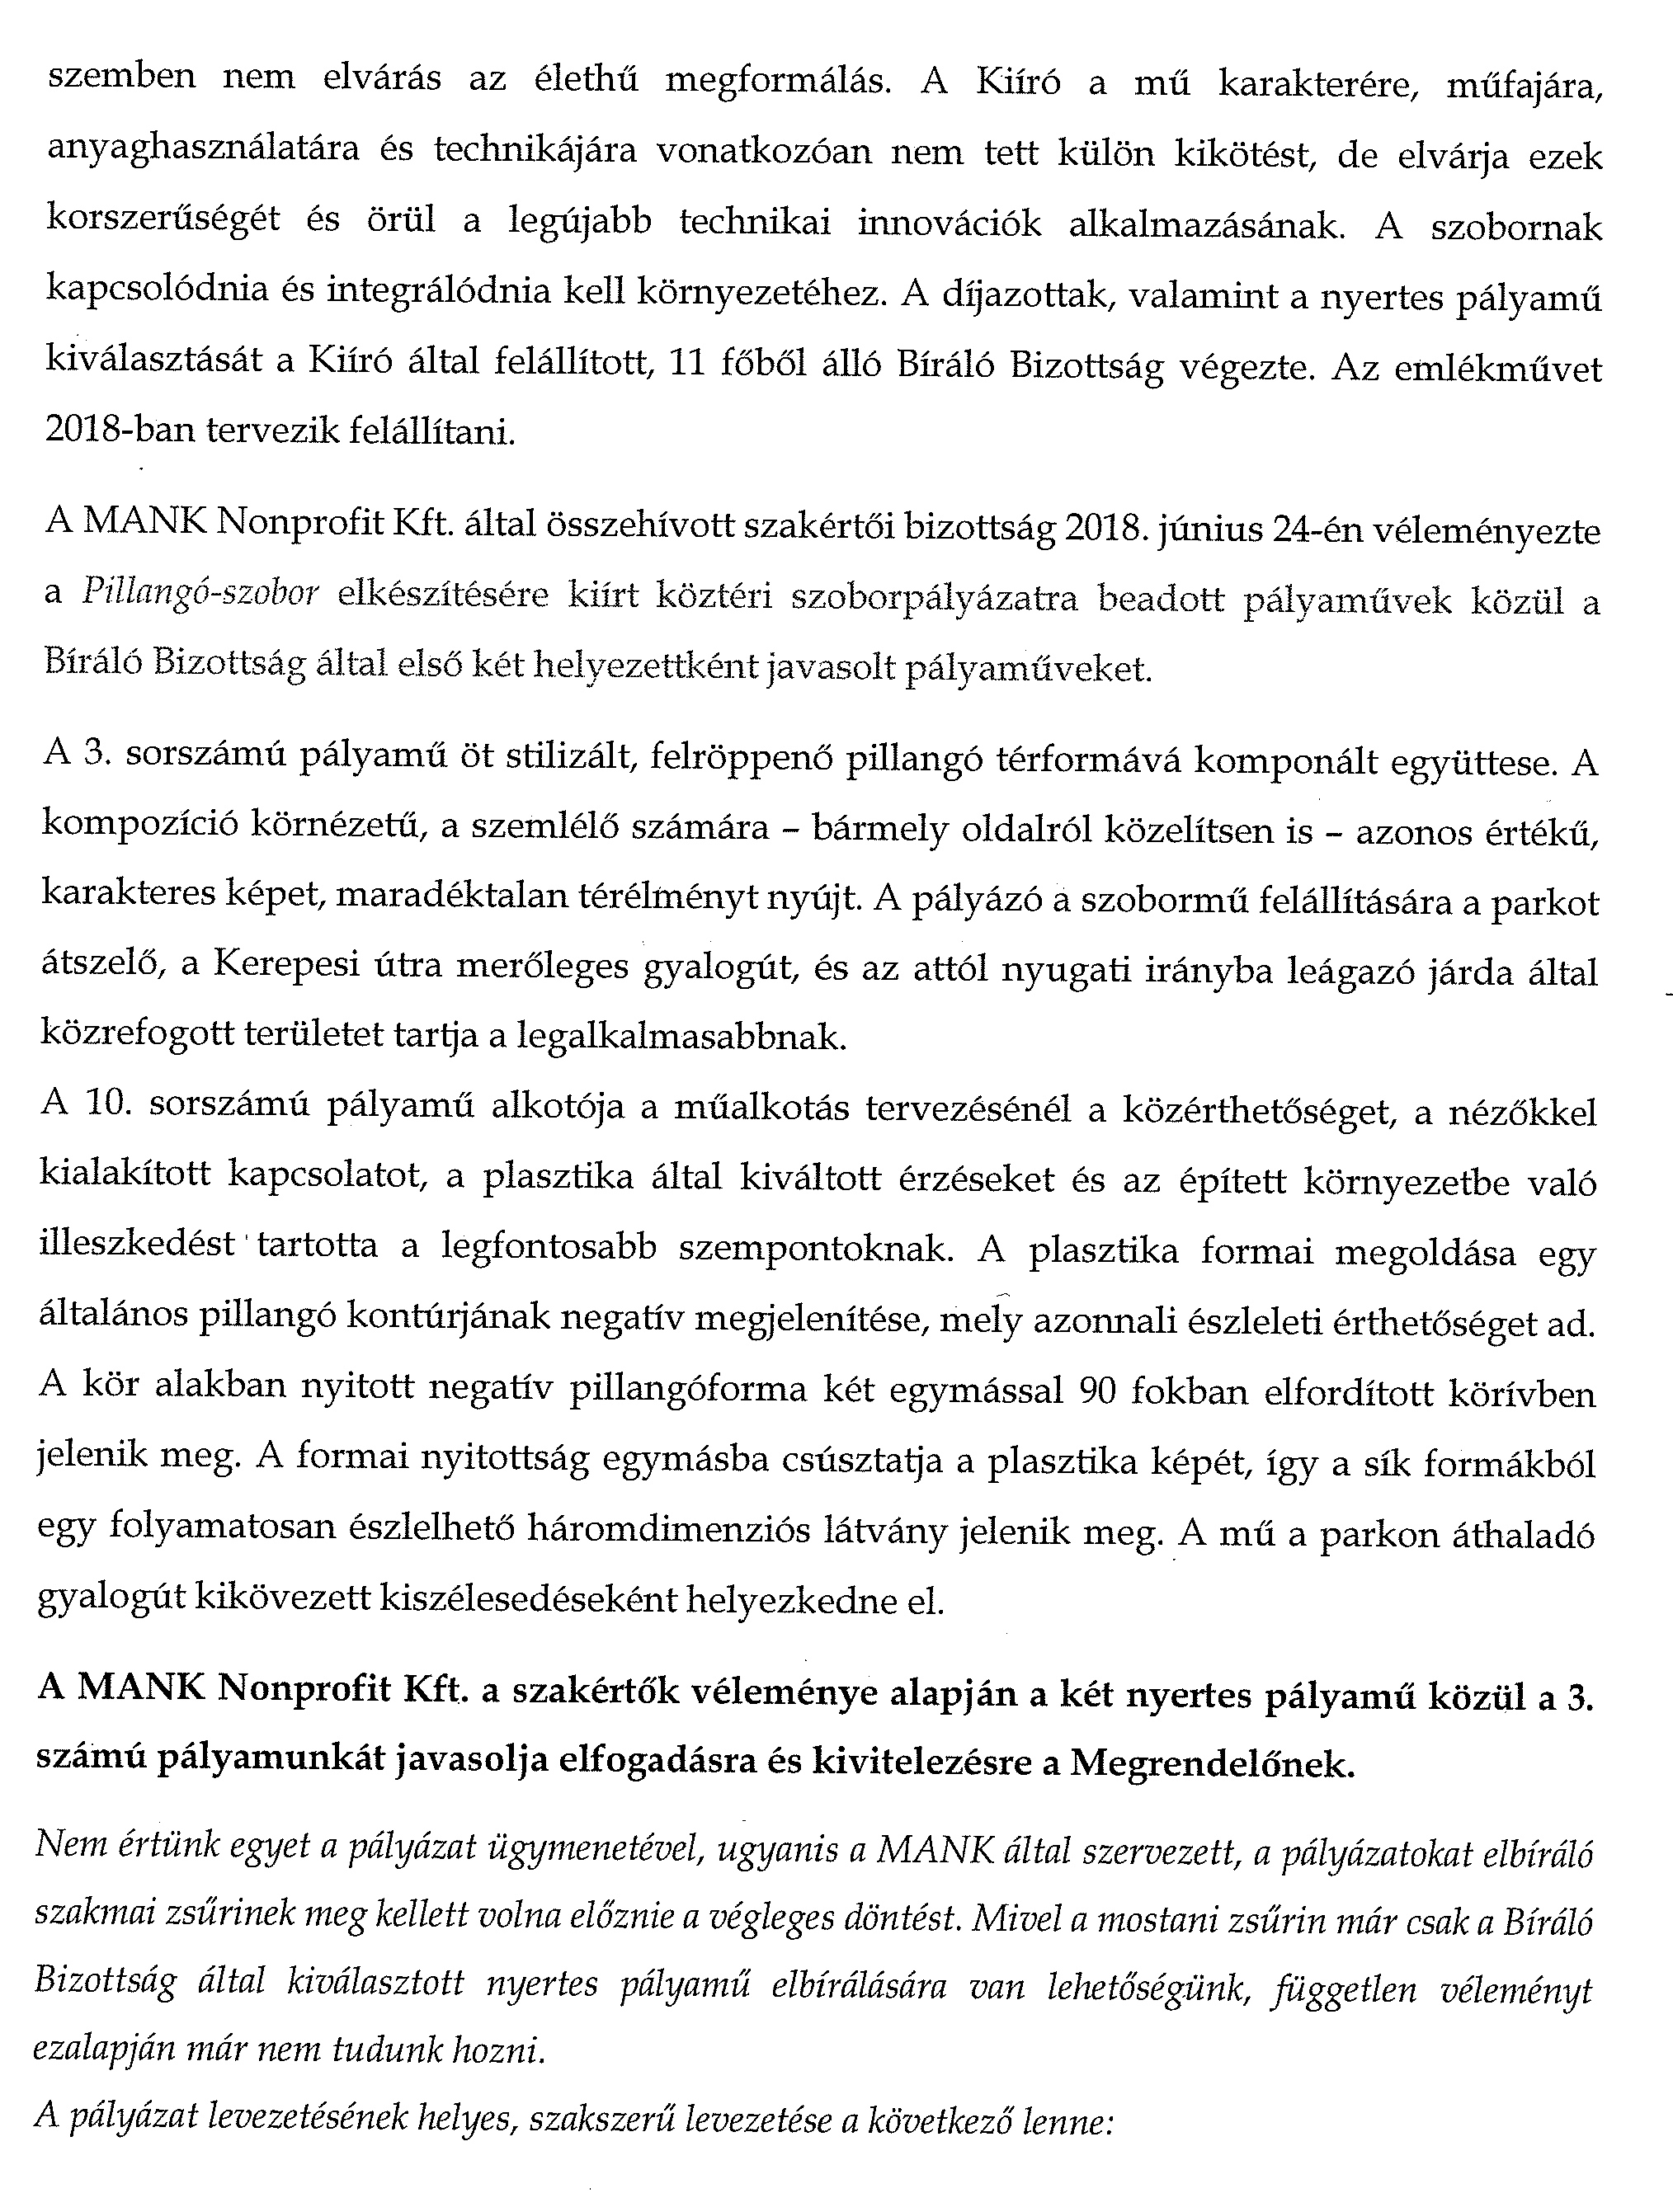 mank_pillango_slachta-3.jpg